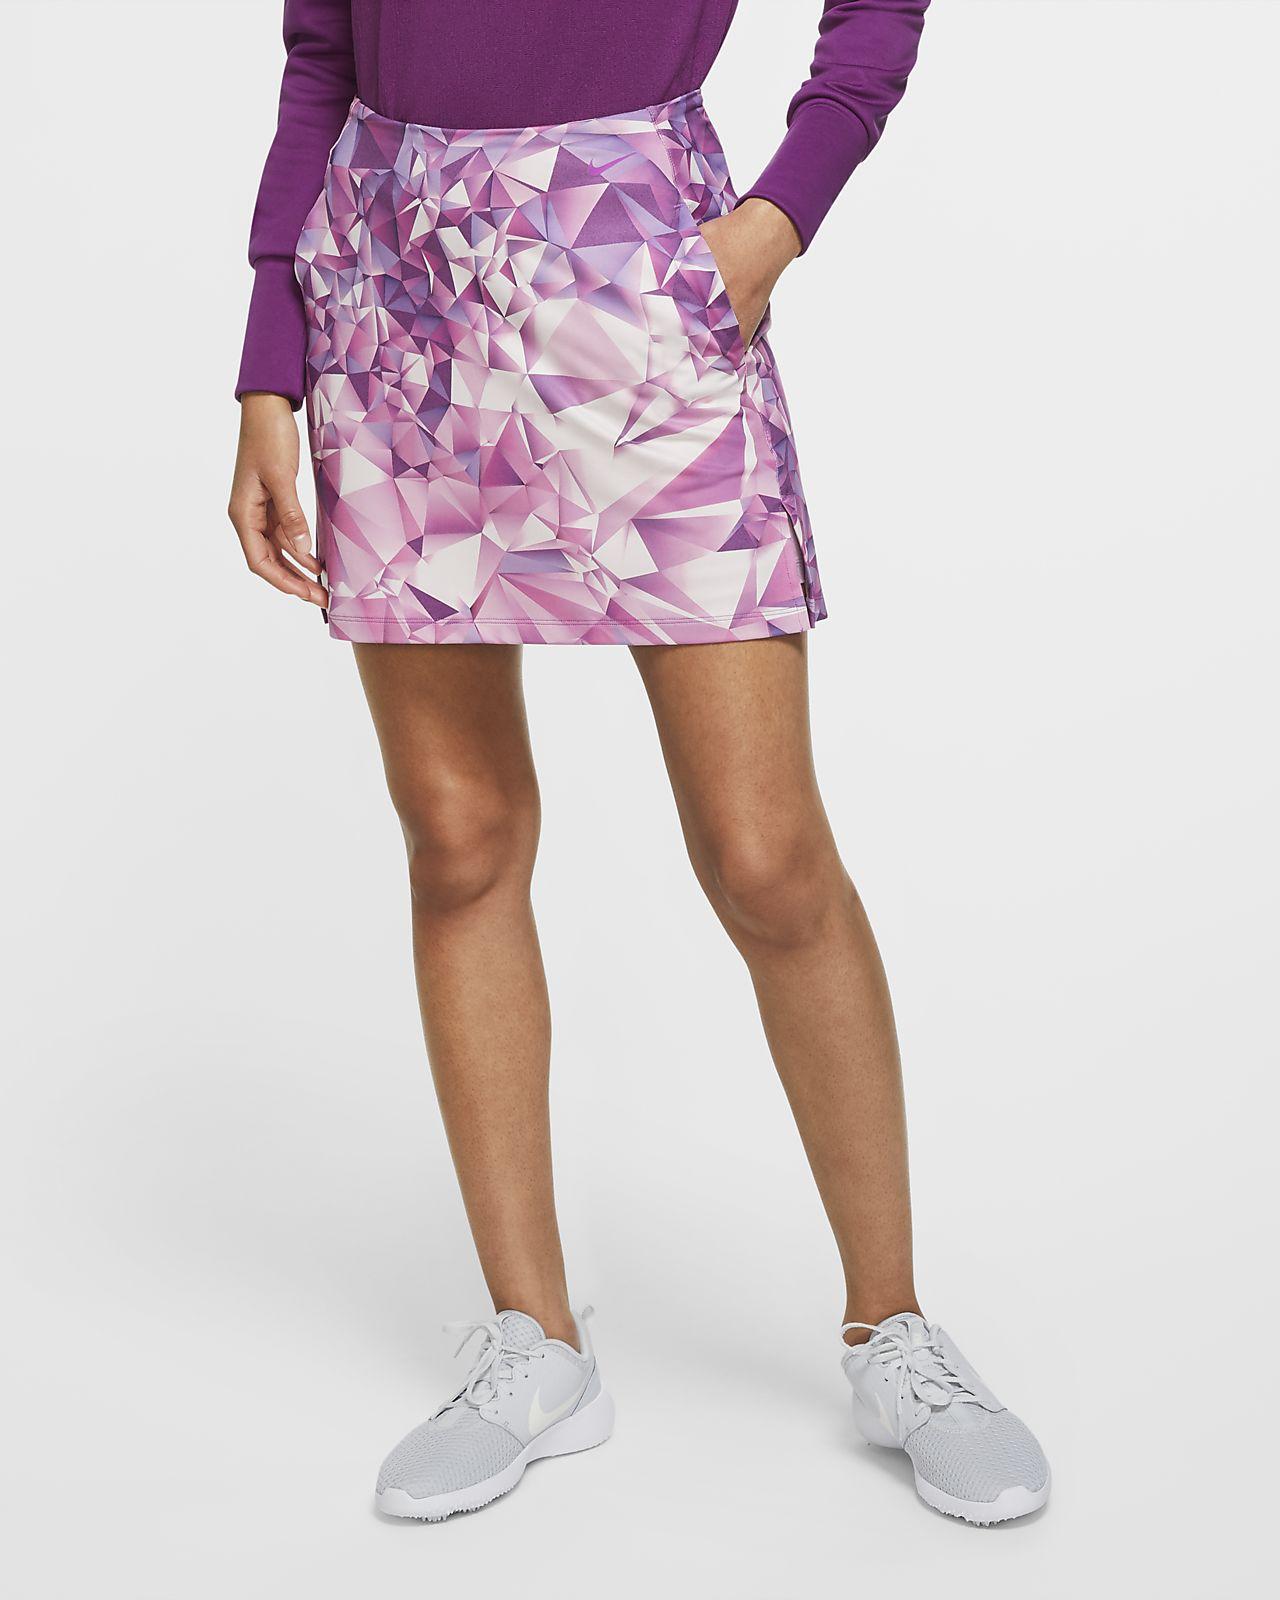 Nike Dri-FIT UV Victory Women's 43cm (approx.) Printed Golf Skirt